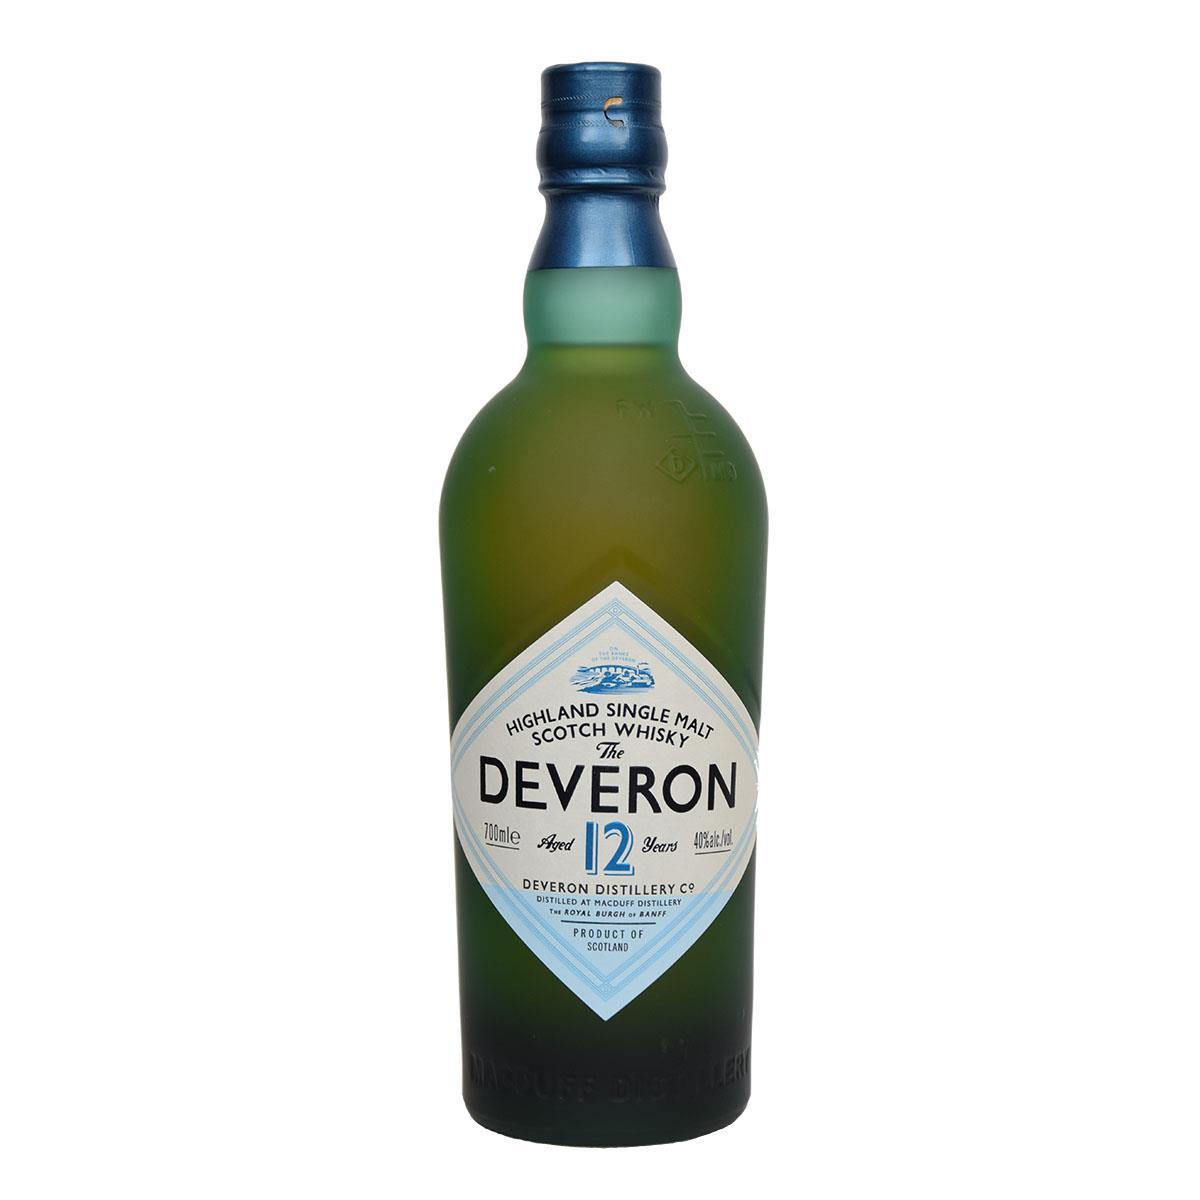 The Deveron 700ml